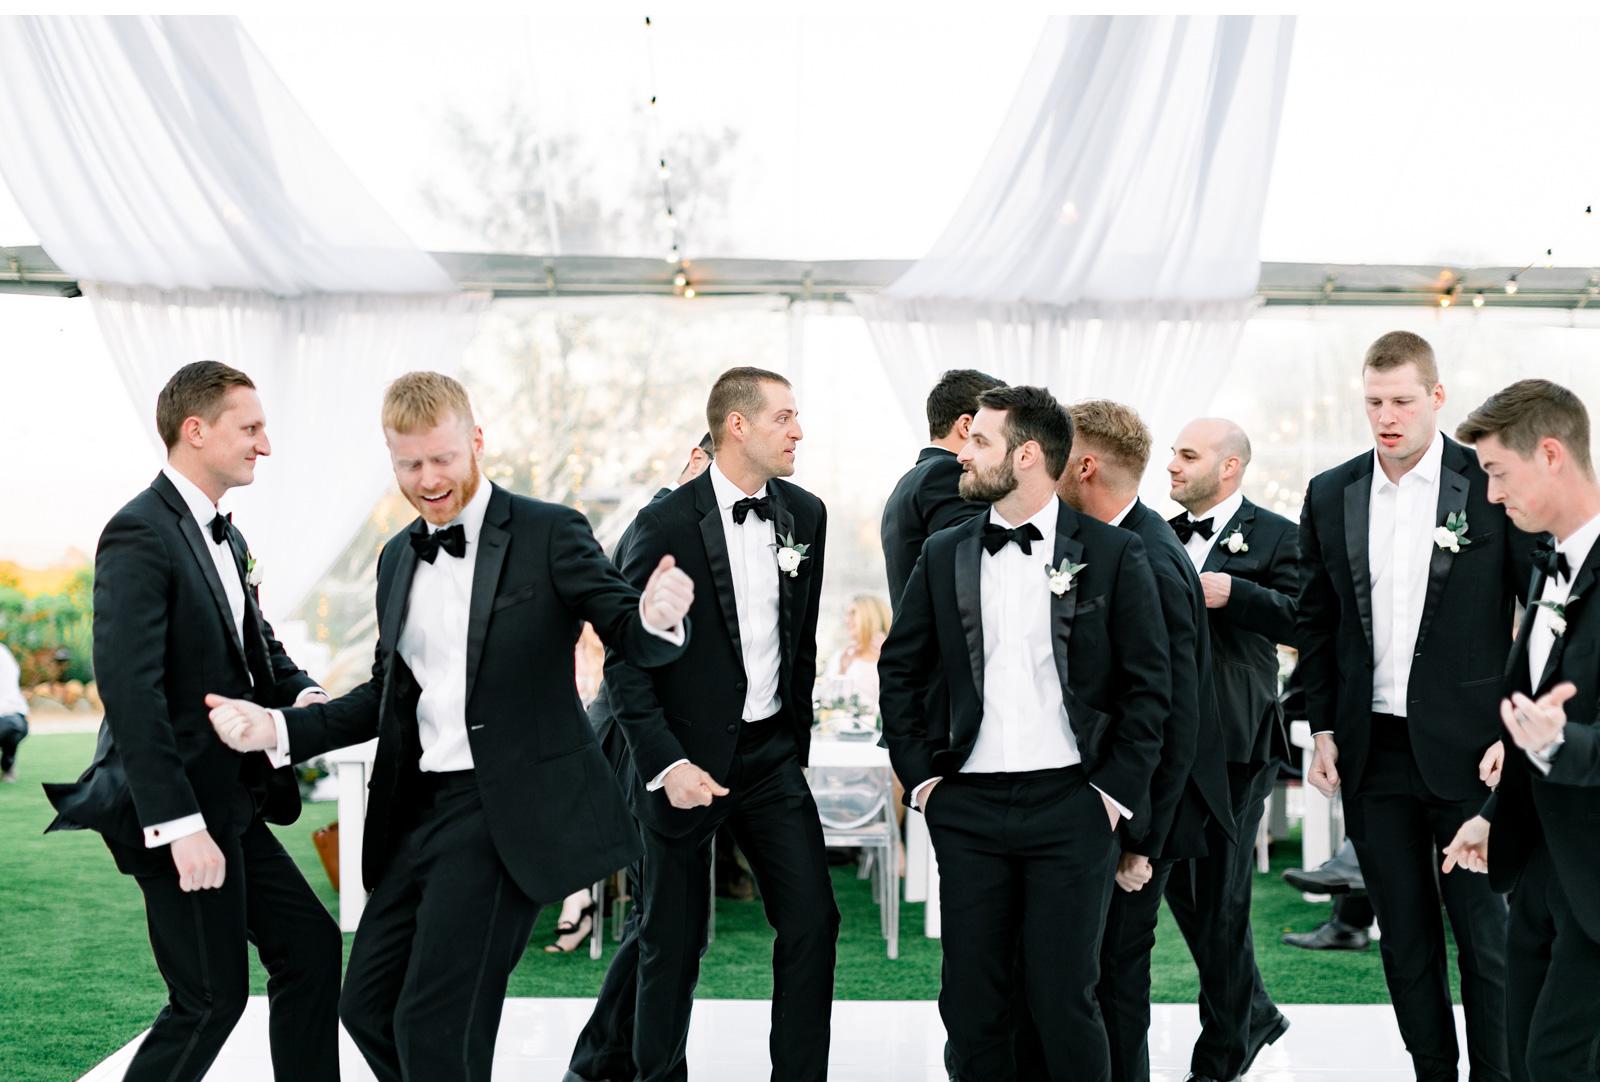 West-Coast-Wedding-Photographer-Style-Me-Pretty-Malibu-Weddings-Fine-Art-Wedding-Photography-Natalie-Schutt-Photography_03.jpg